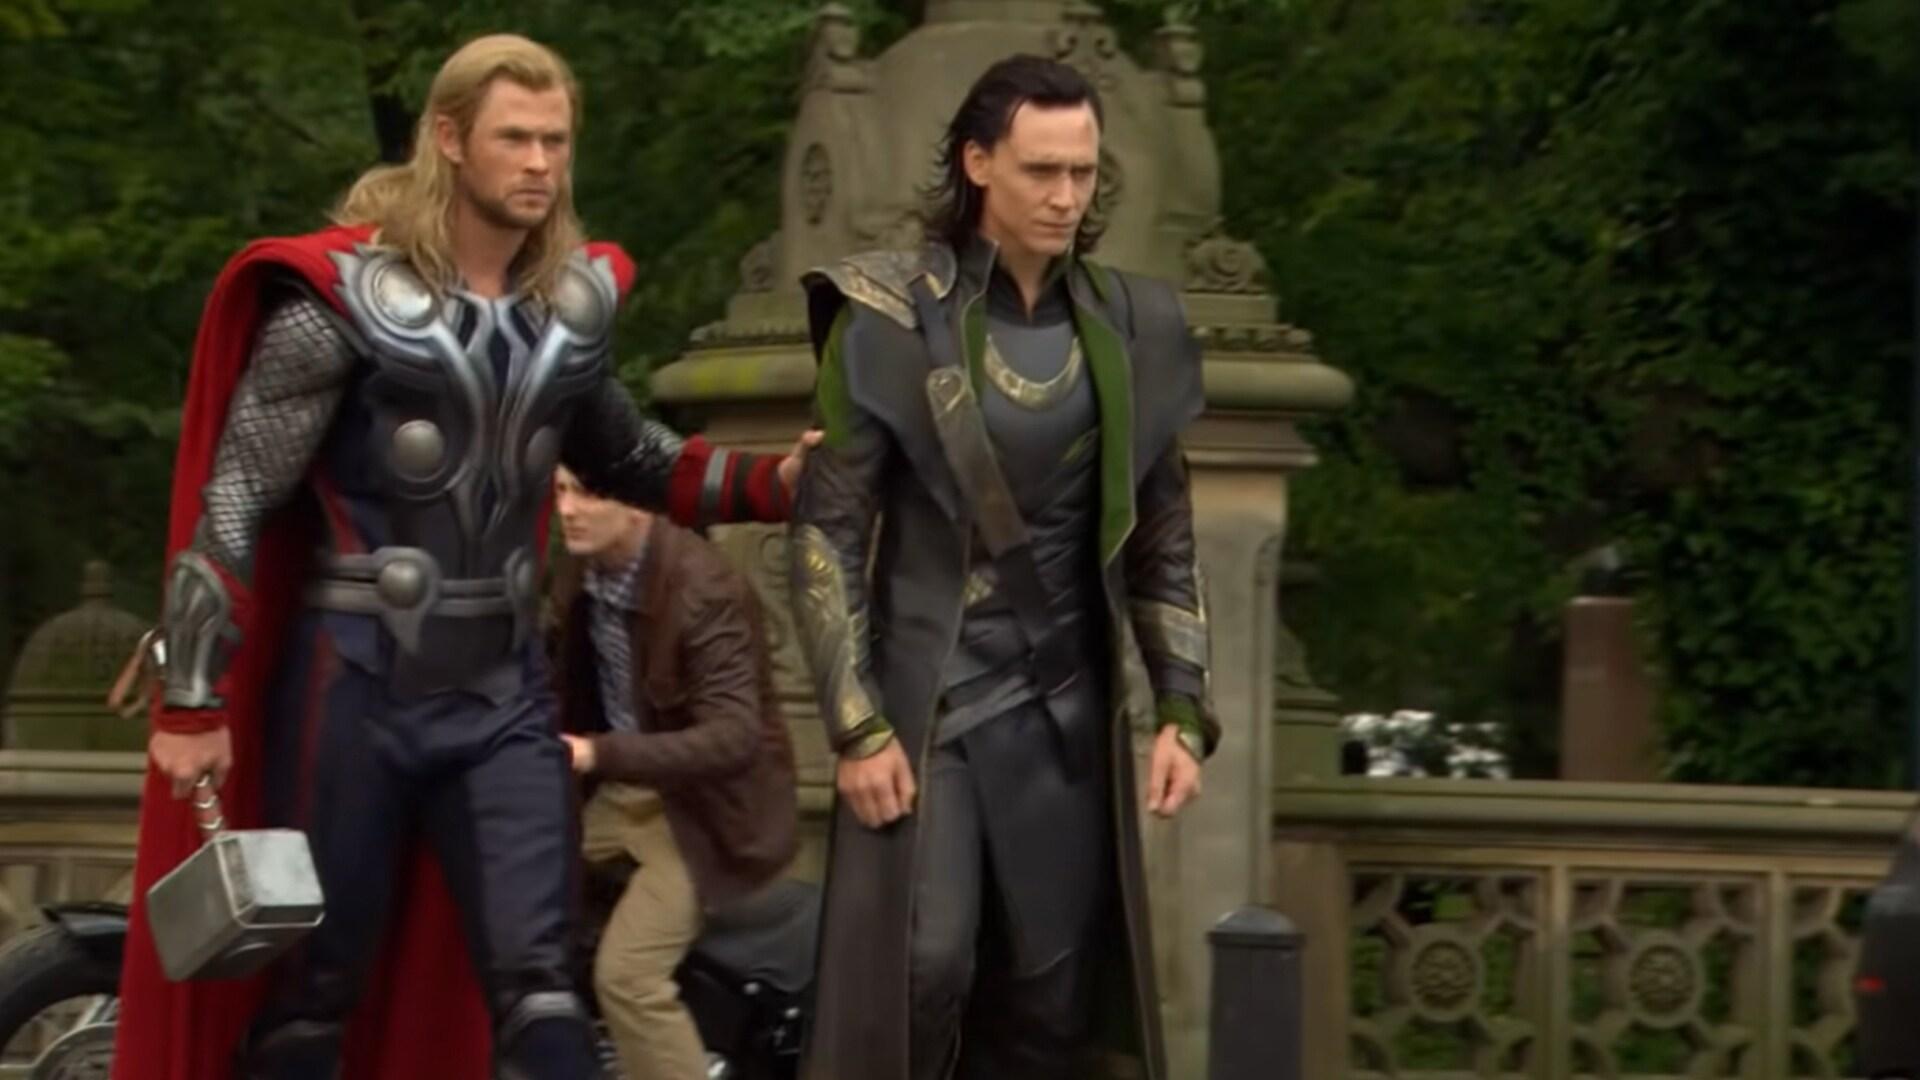 Disney + Deets on Marvel Studios' The Avengers now streaming on Disney Plus